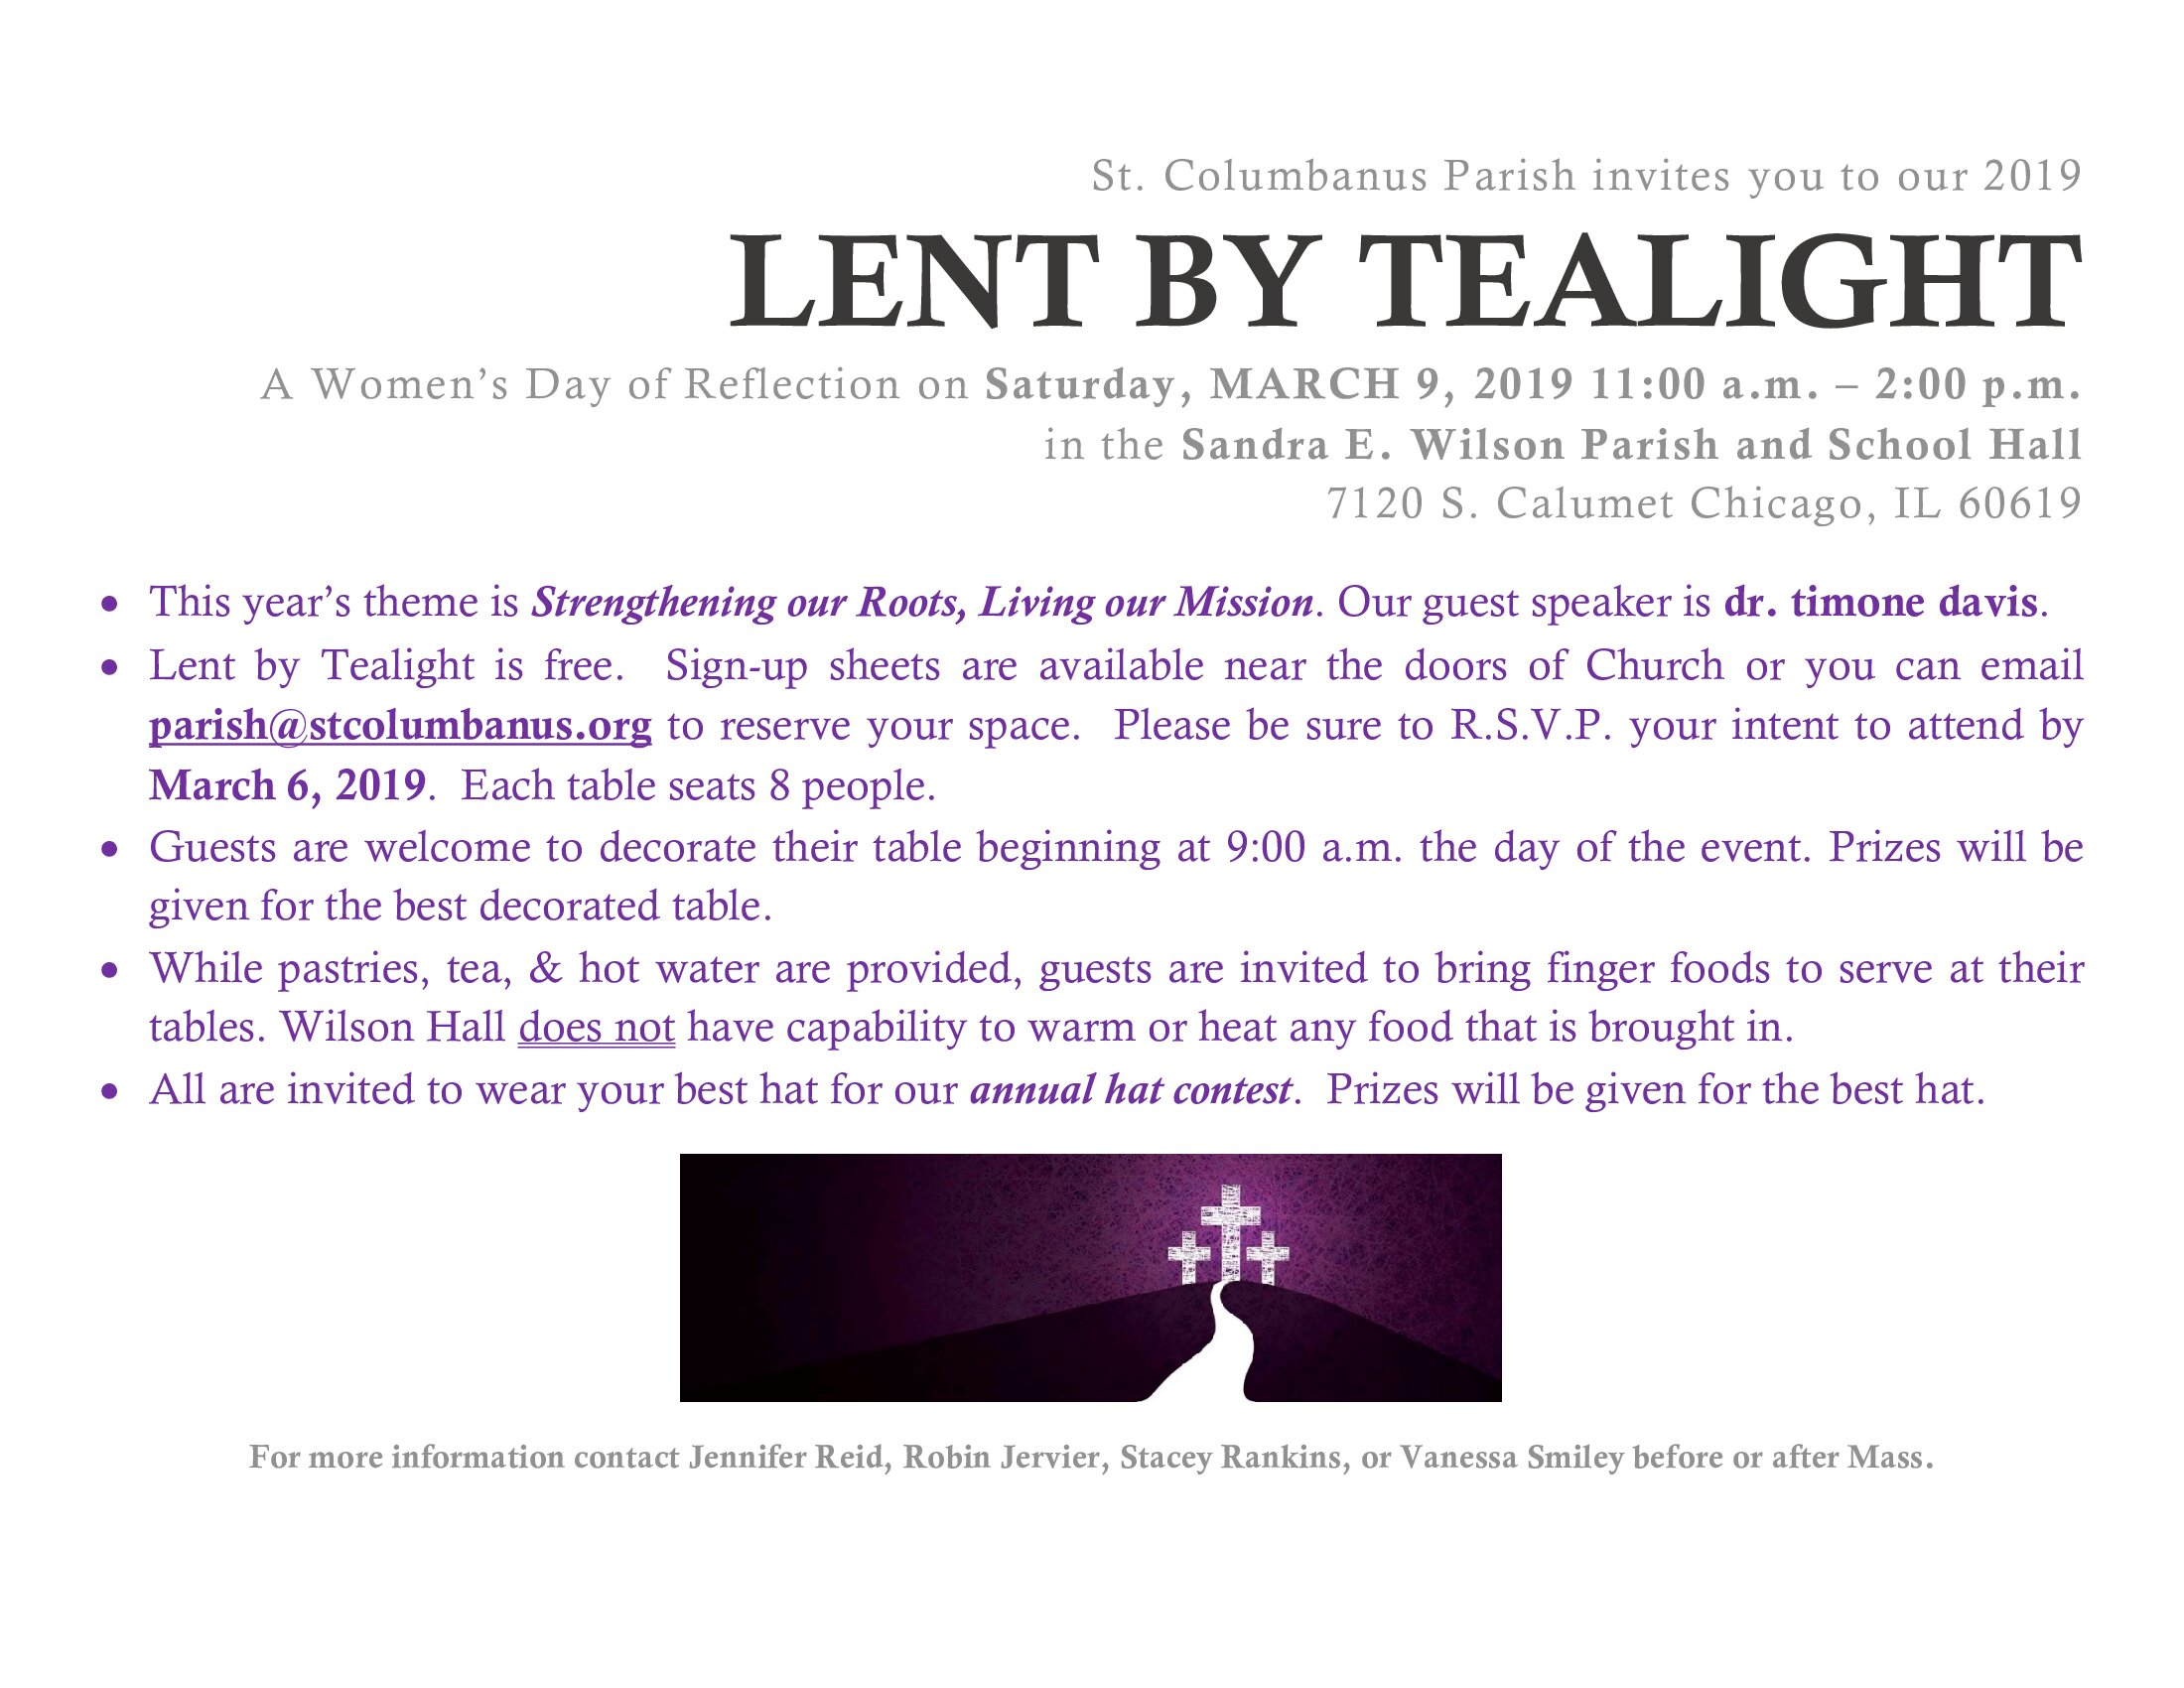 Lent by Tealight 2019 Flyer.jpg